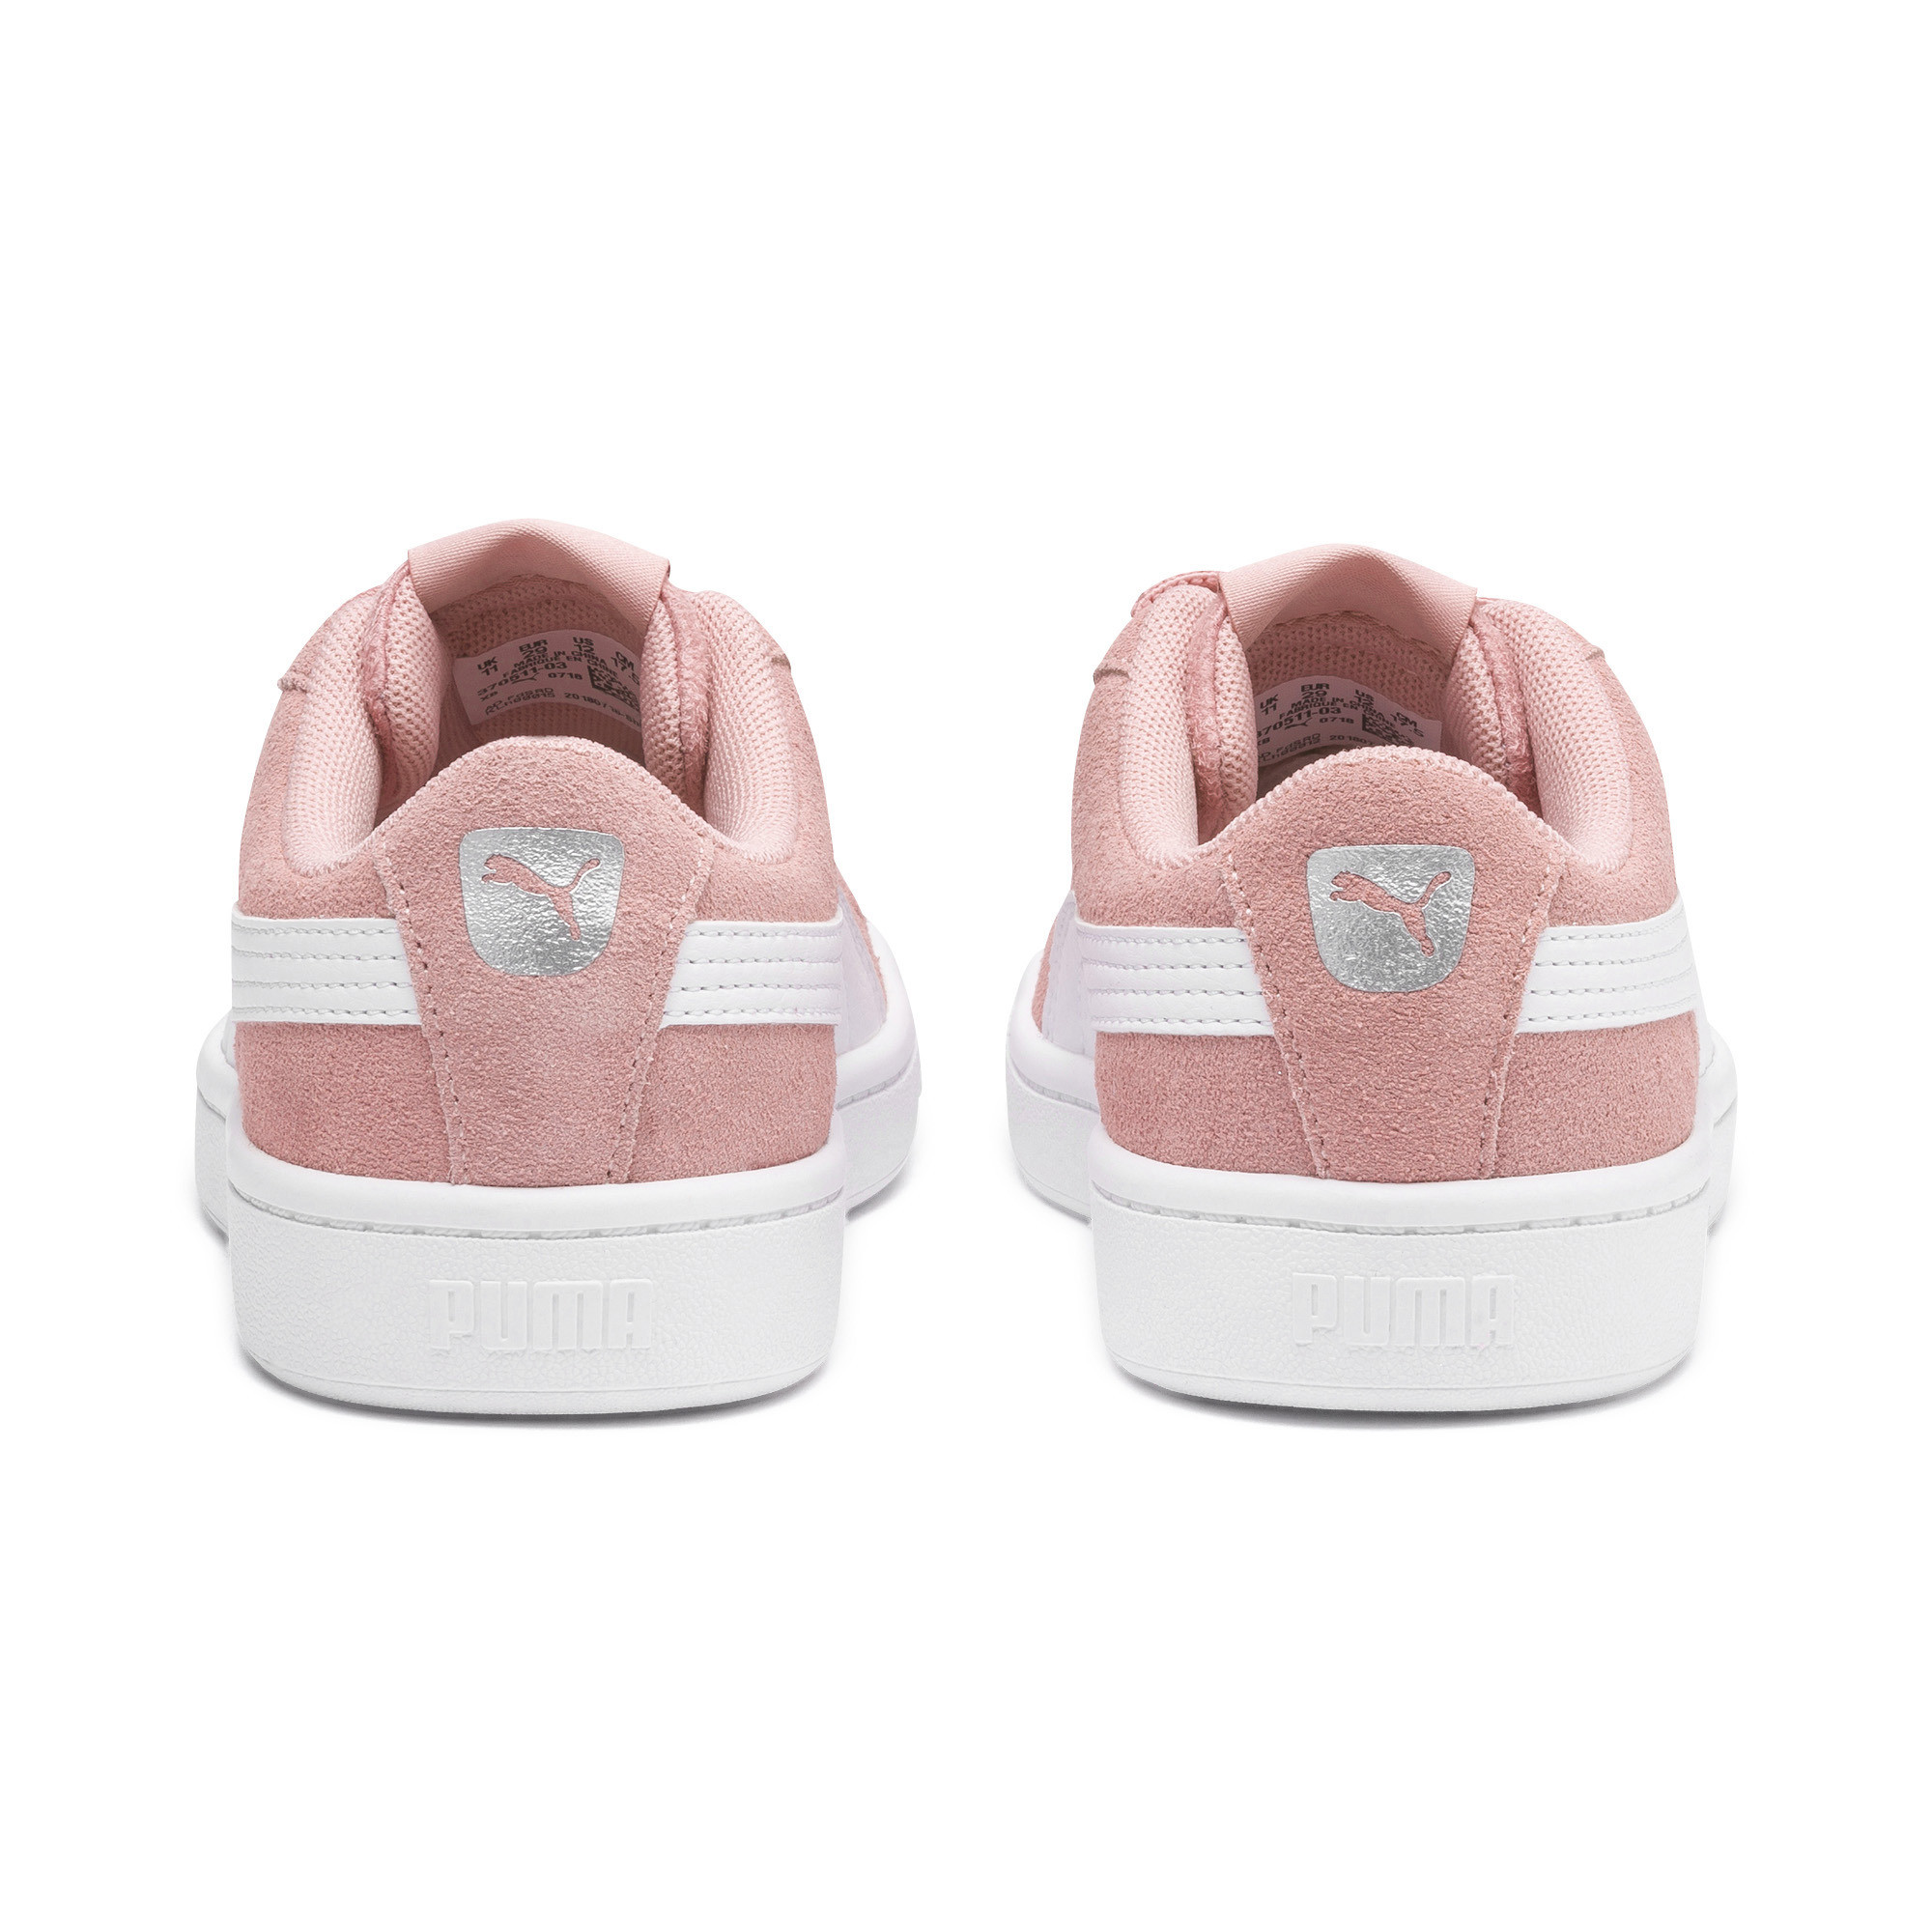 PUMA-PUMA-Vikky-v2-Suede-Little-Kids-039-Shoes-Girls-Shoe-Kids thumbnail 3